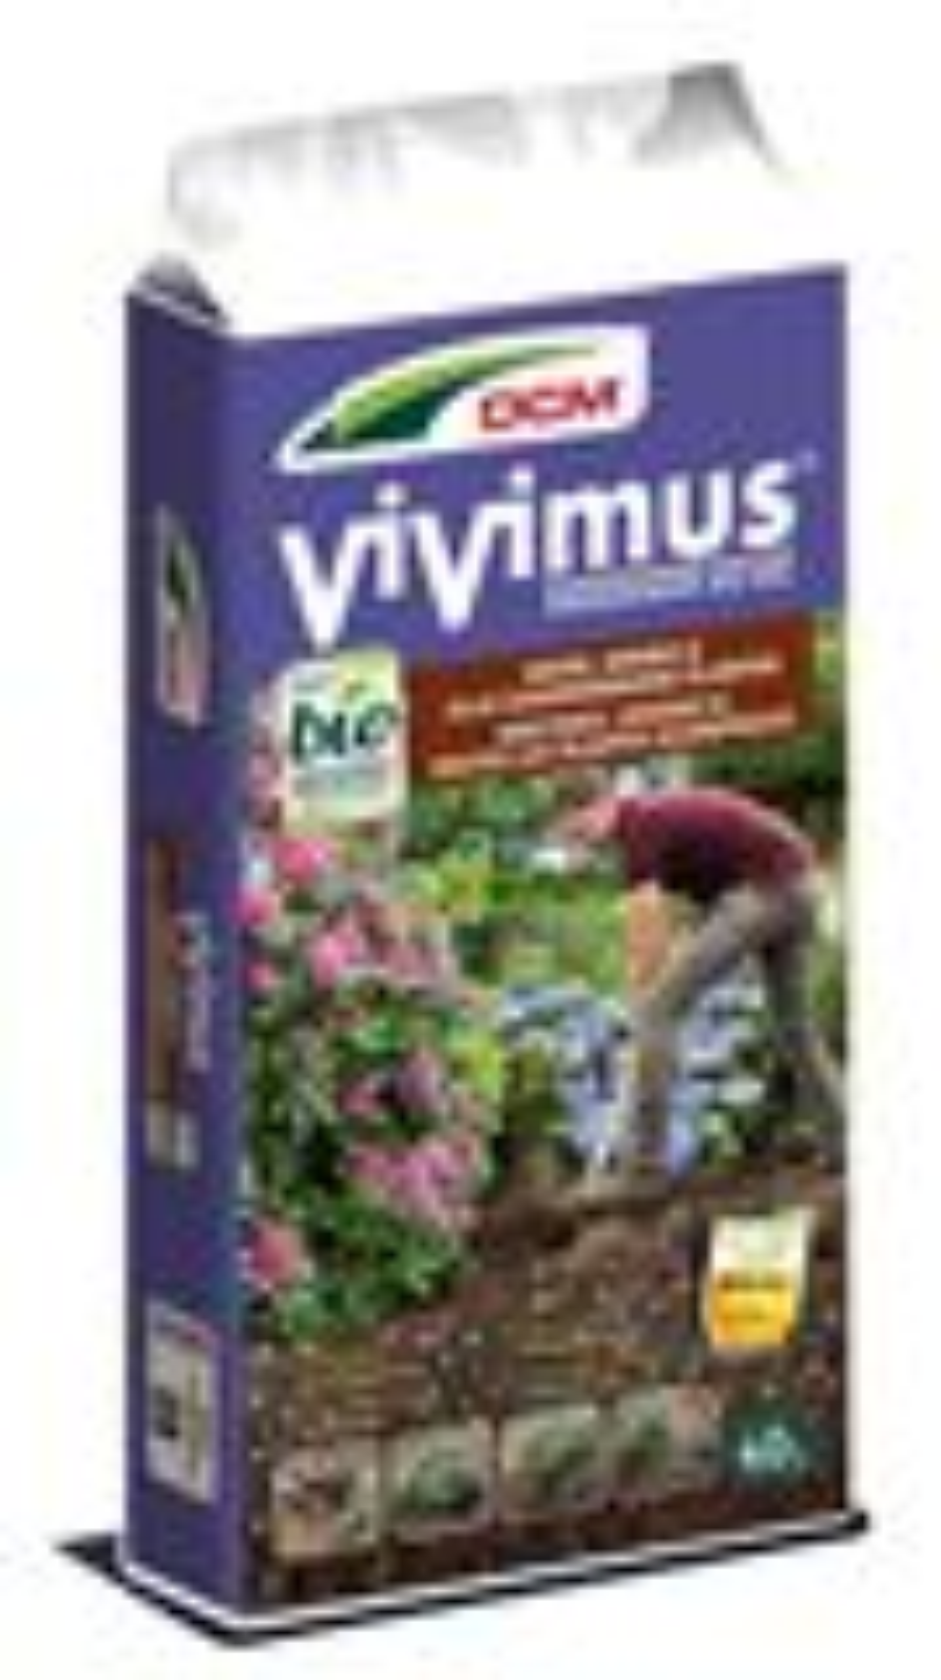 Vivimus bodemverbeteraar rhododendron,hortensia, & zuurminnende planten 40L - Bio